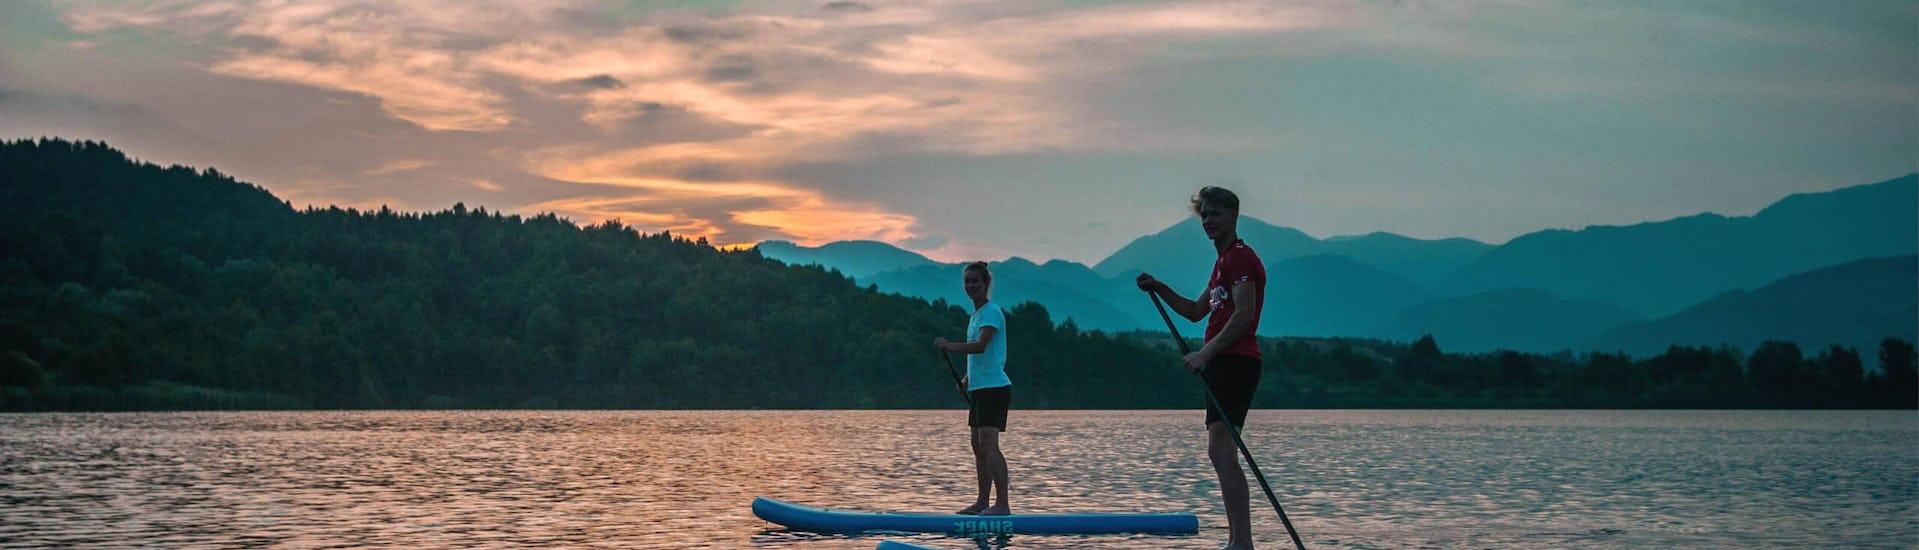 Watching magical sunset during Stand Up Paddle Sunset Tour - Lake Velenje organized by Funpark Menina